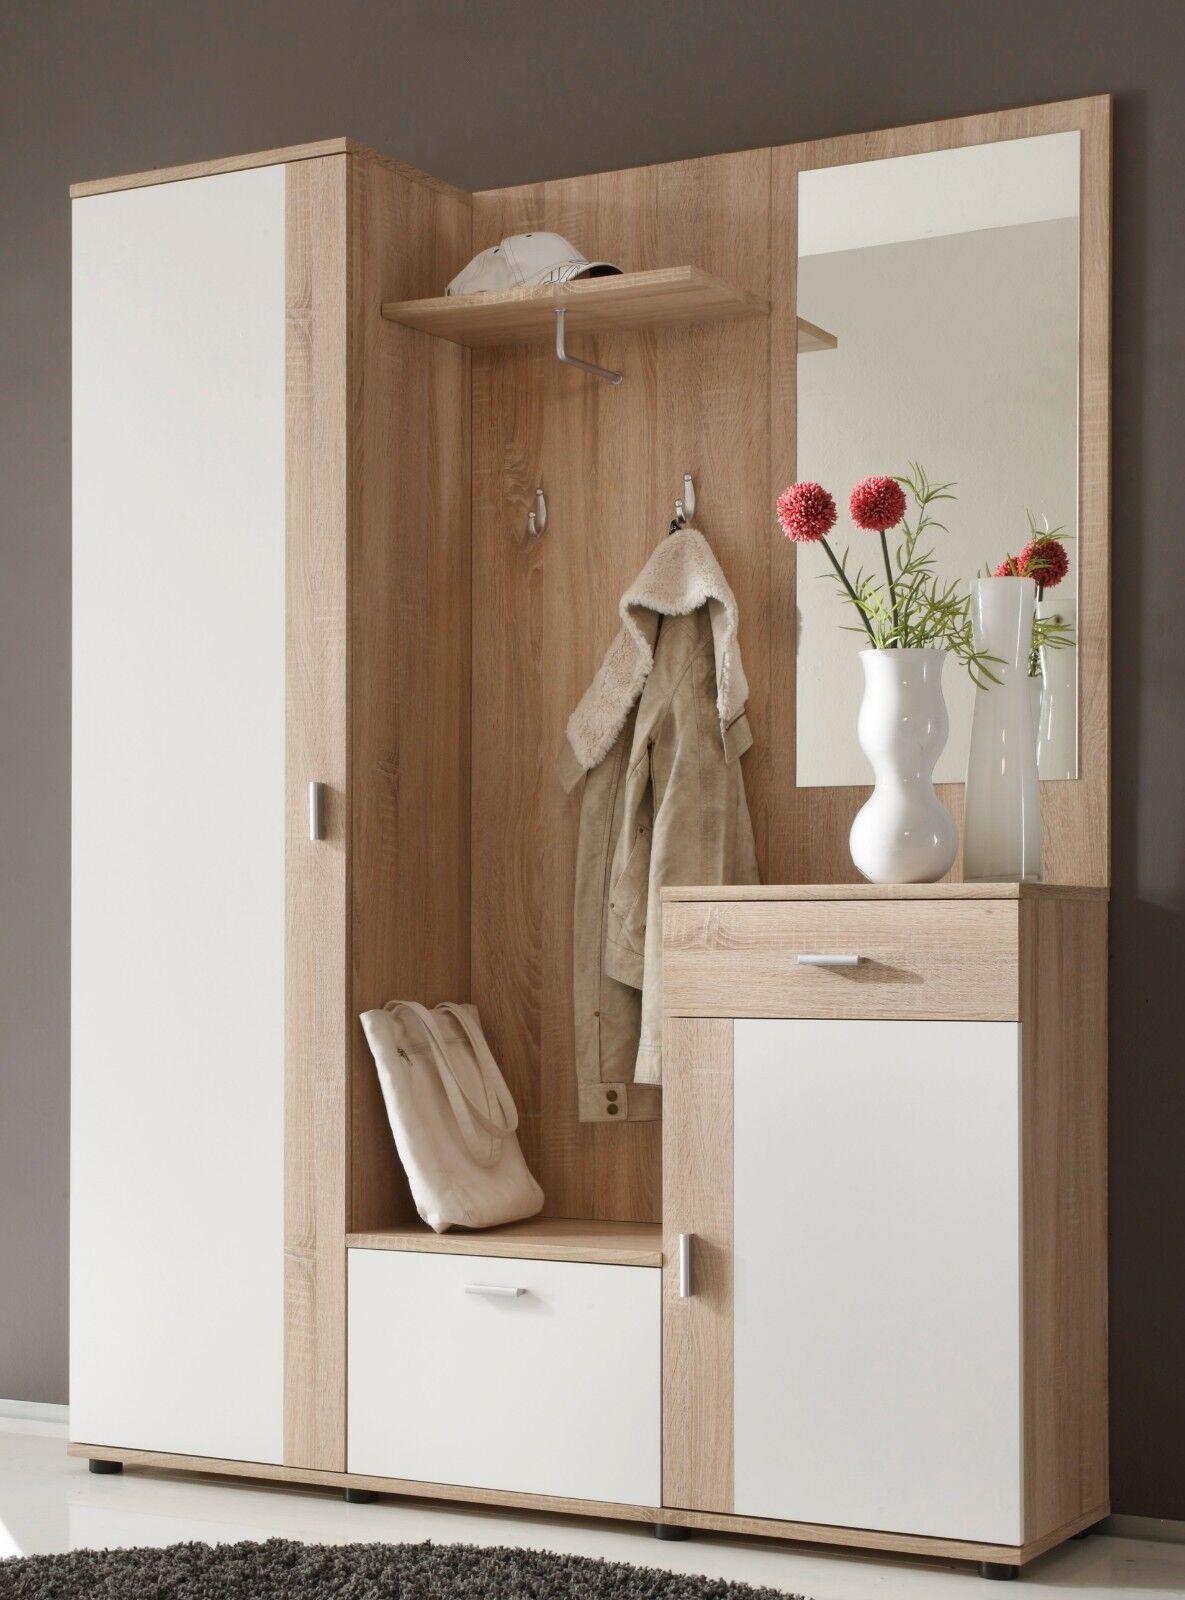 Moderne Wandgarderobe Weiß.Moderne Wandgarderobe 5 Teilig Sonoma Weiß Dekor Garderobe Flurgarderobe Design Yatego Com